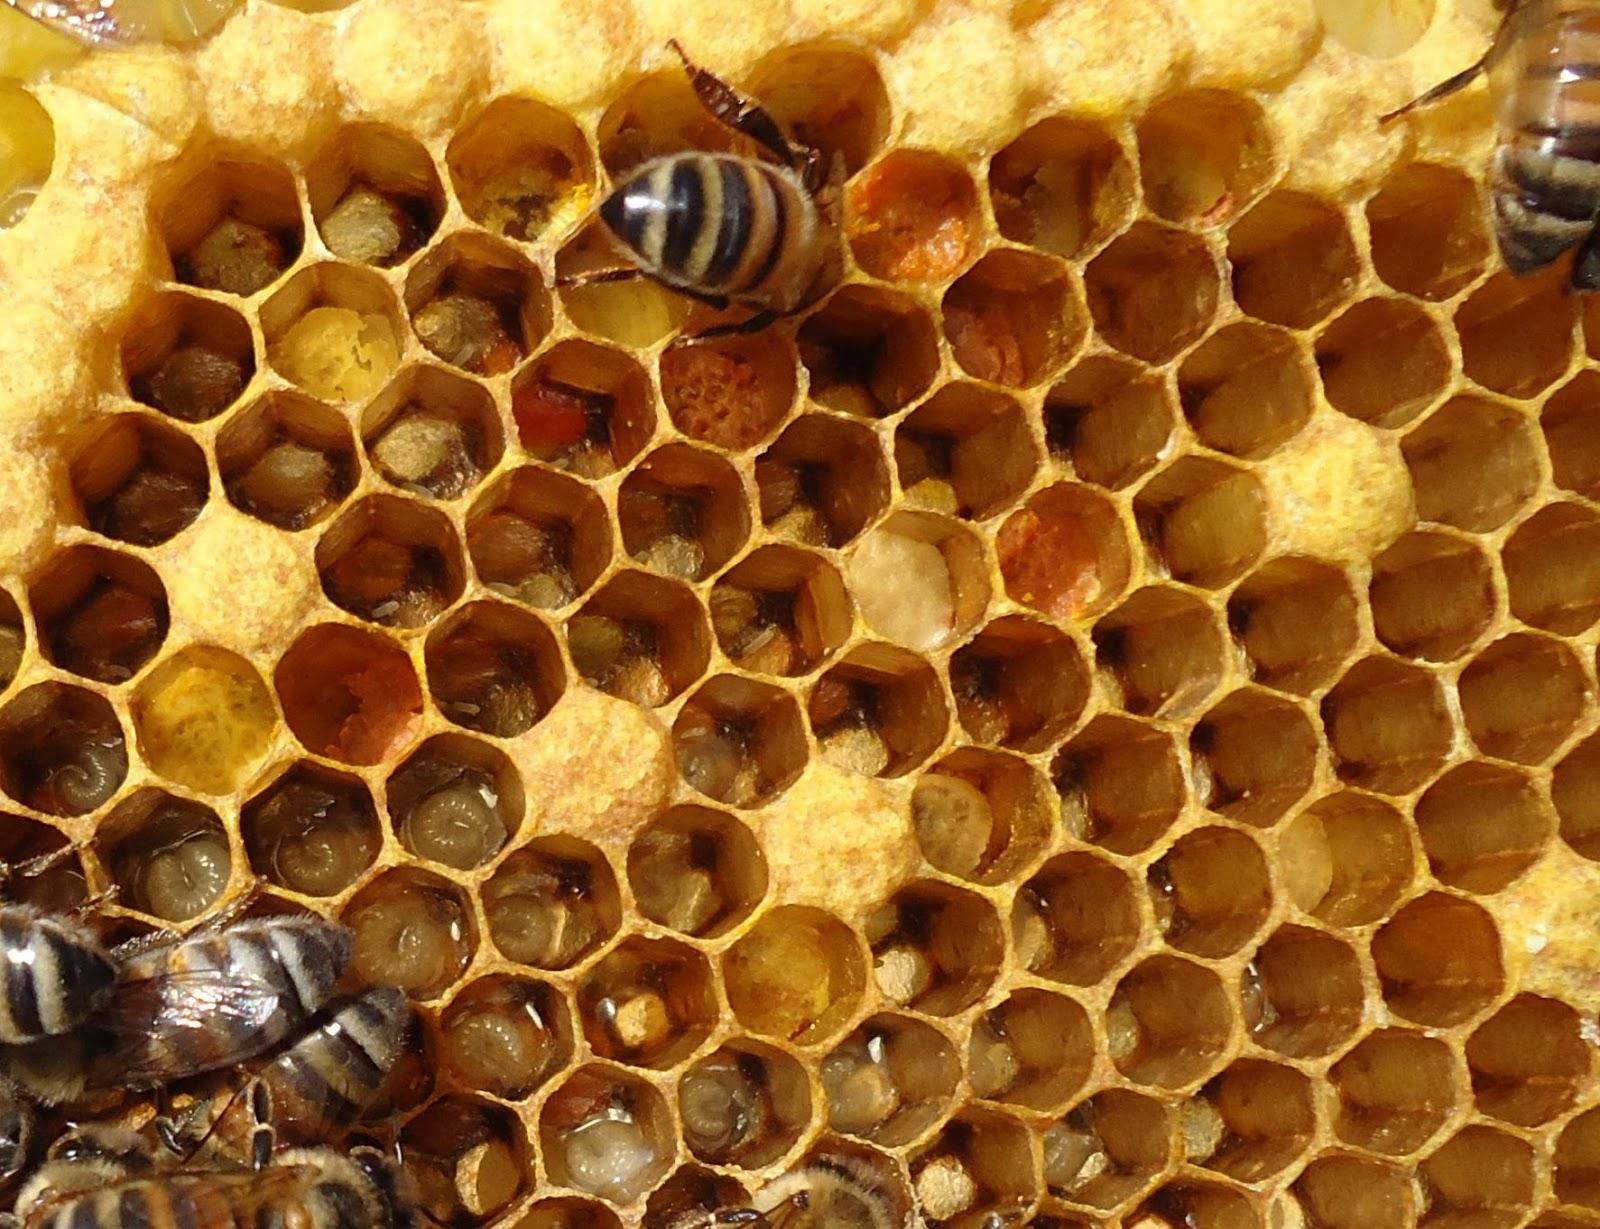 Long Beach Beekeepers: Bee Anatomy at the Bee Club Meeting 2/3